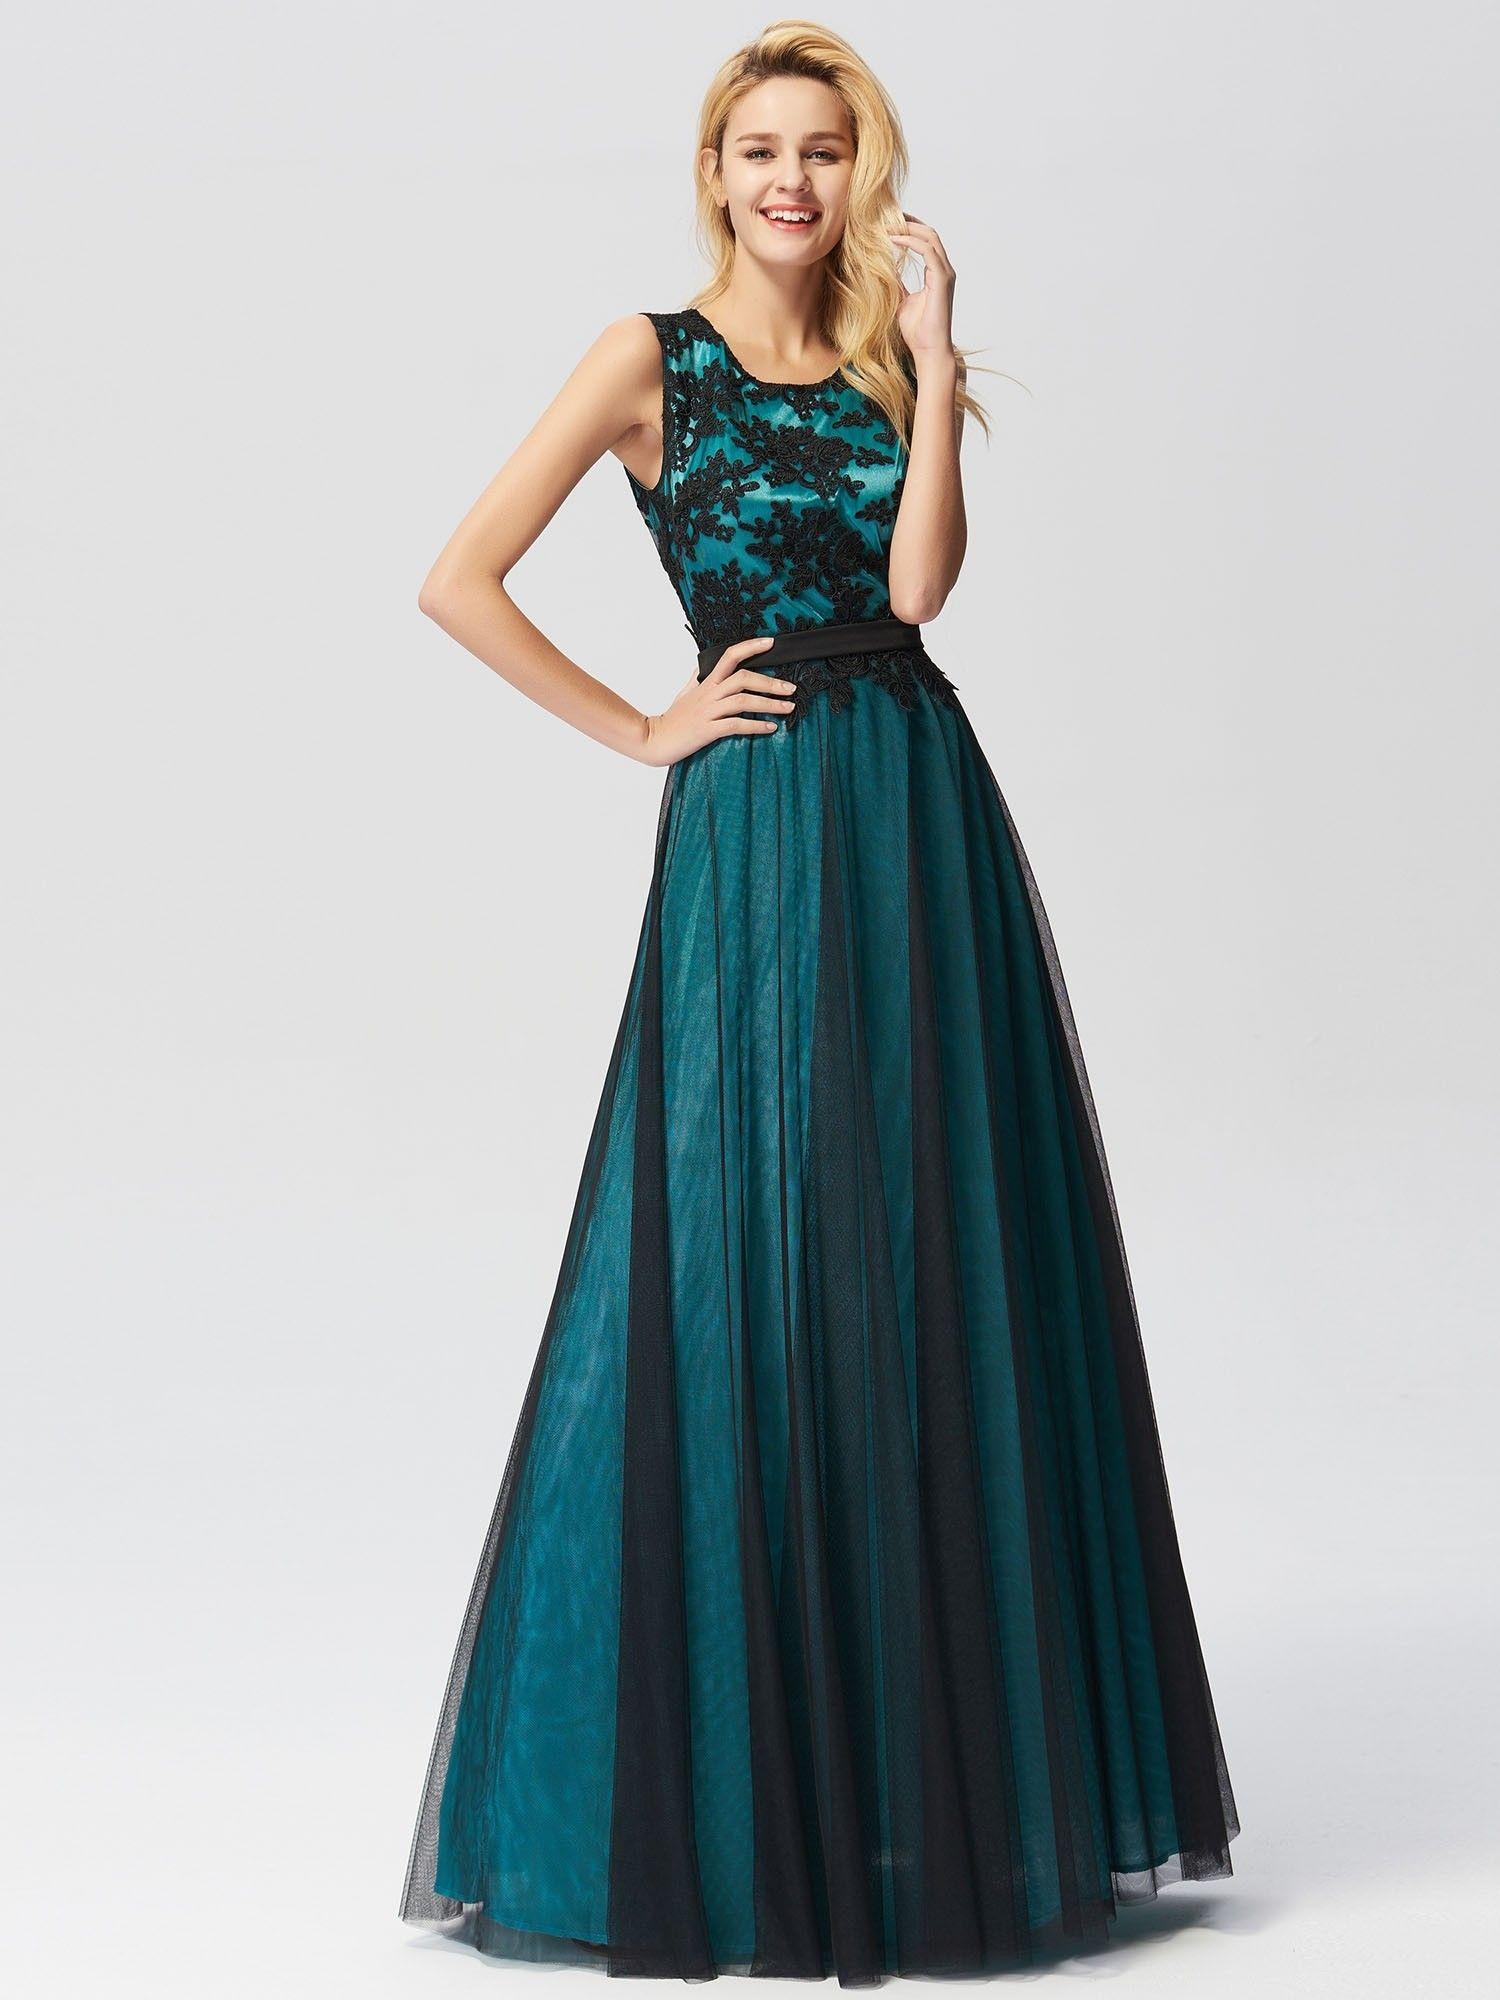 9d0ca4b6c70 Sleeveless Evening Dress with Black Brocade in 2019